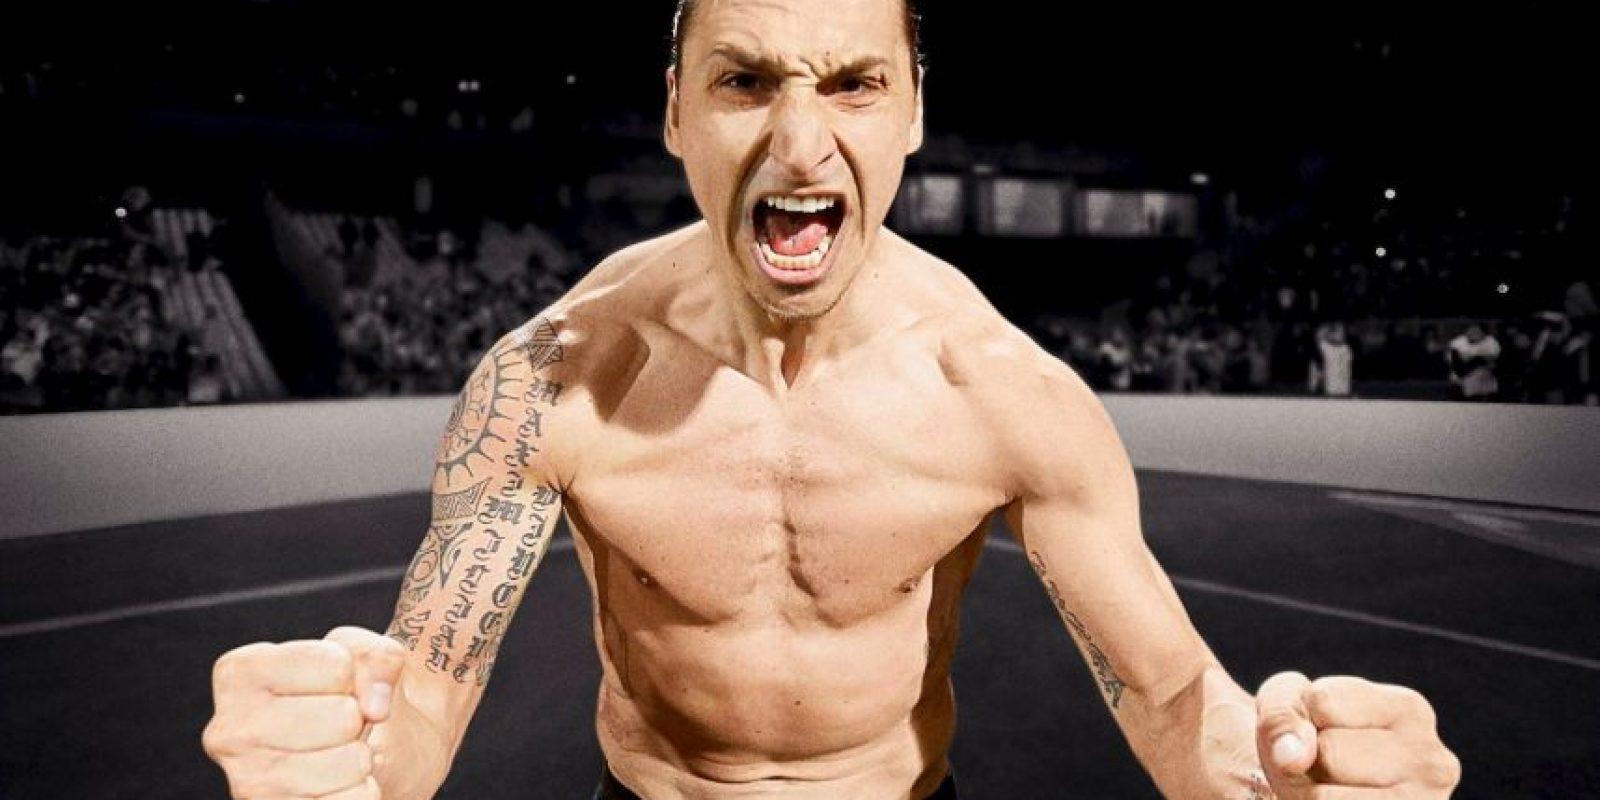 1. Zlatan Ibrahimovic Foto:Vía facebook.com/ZlatanIbrahimovic